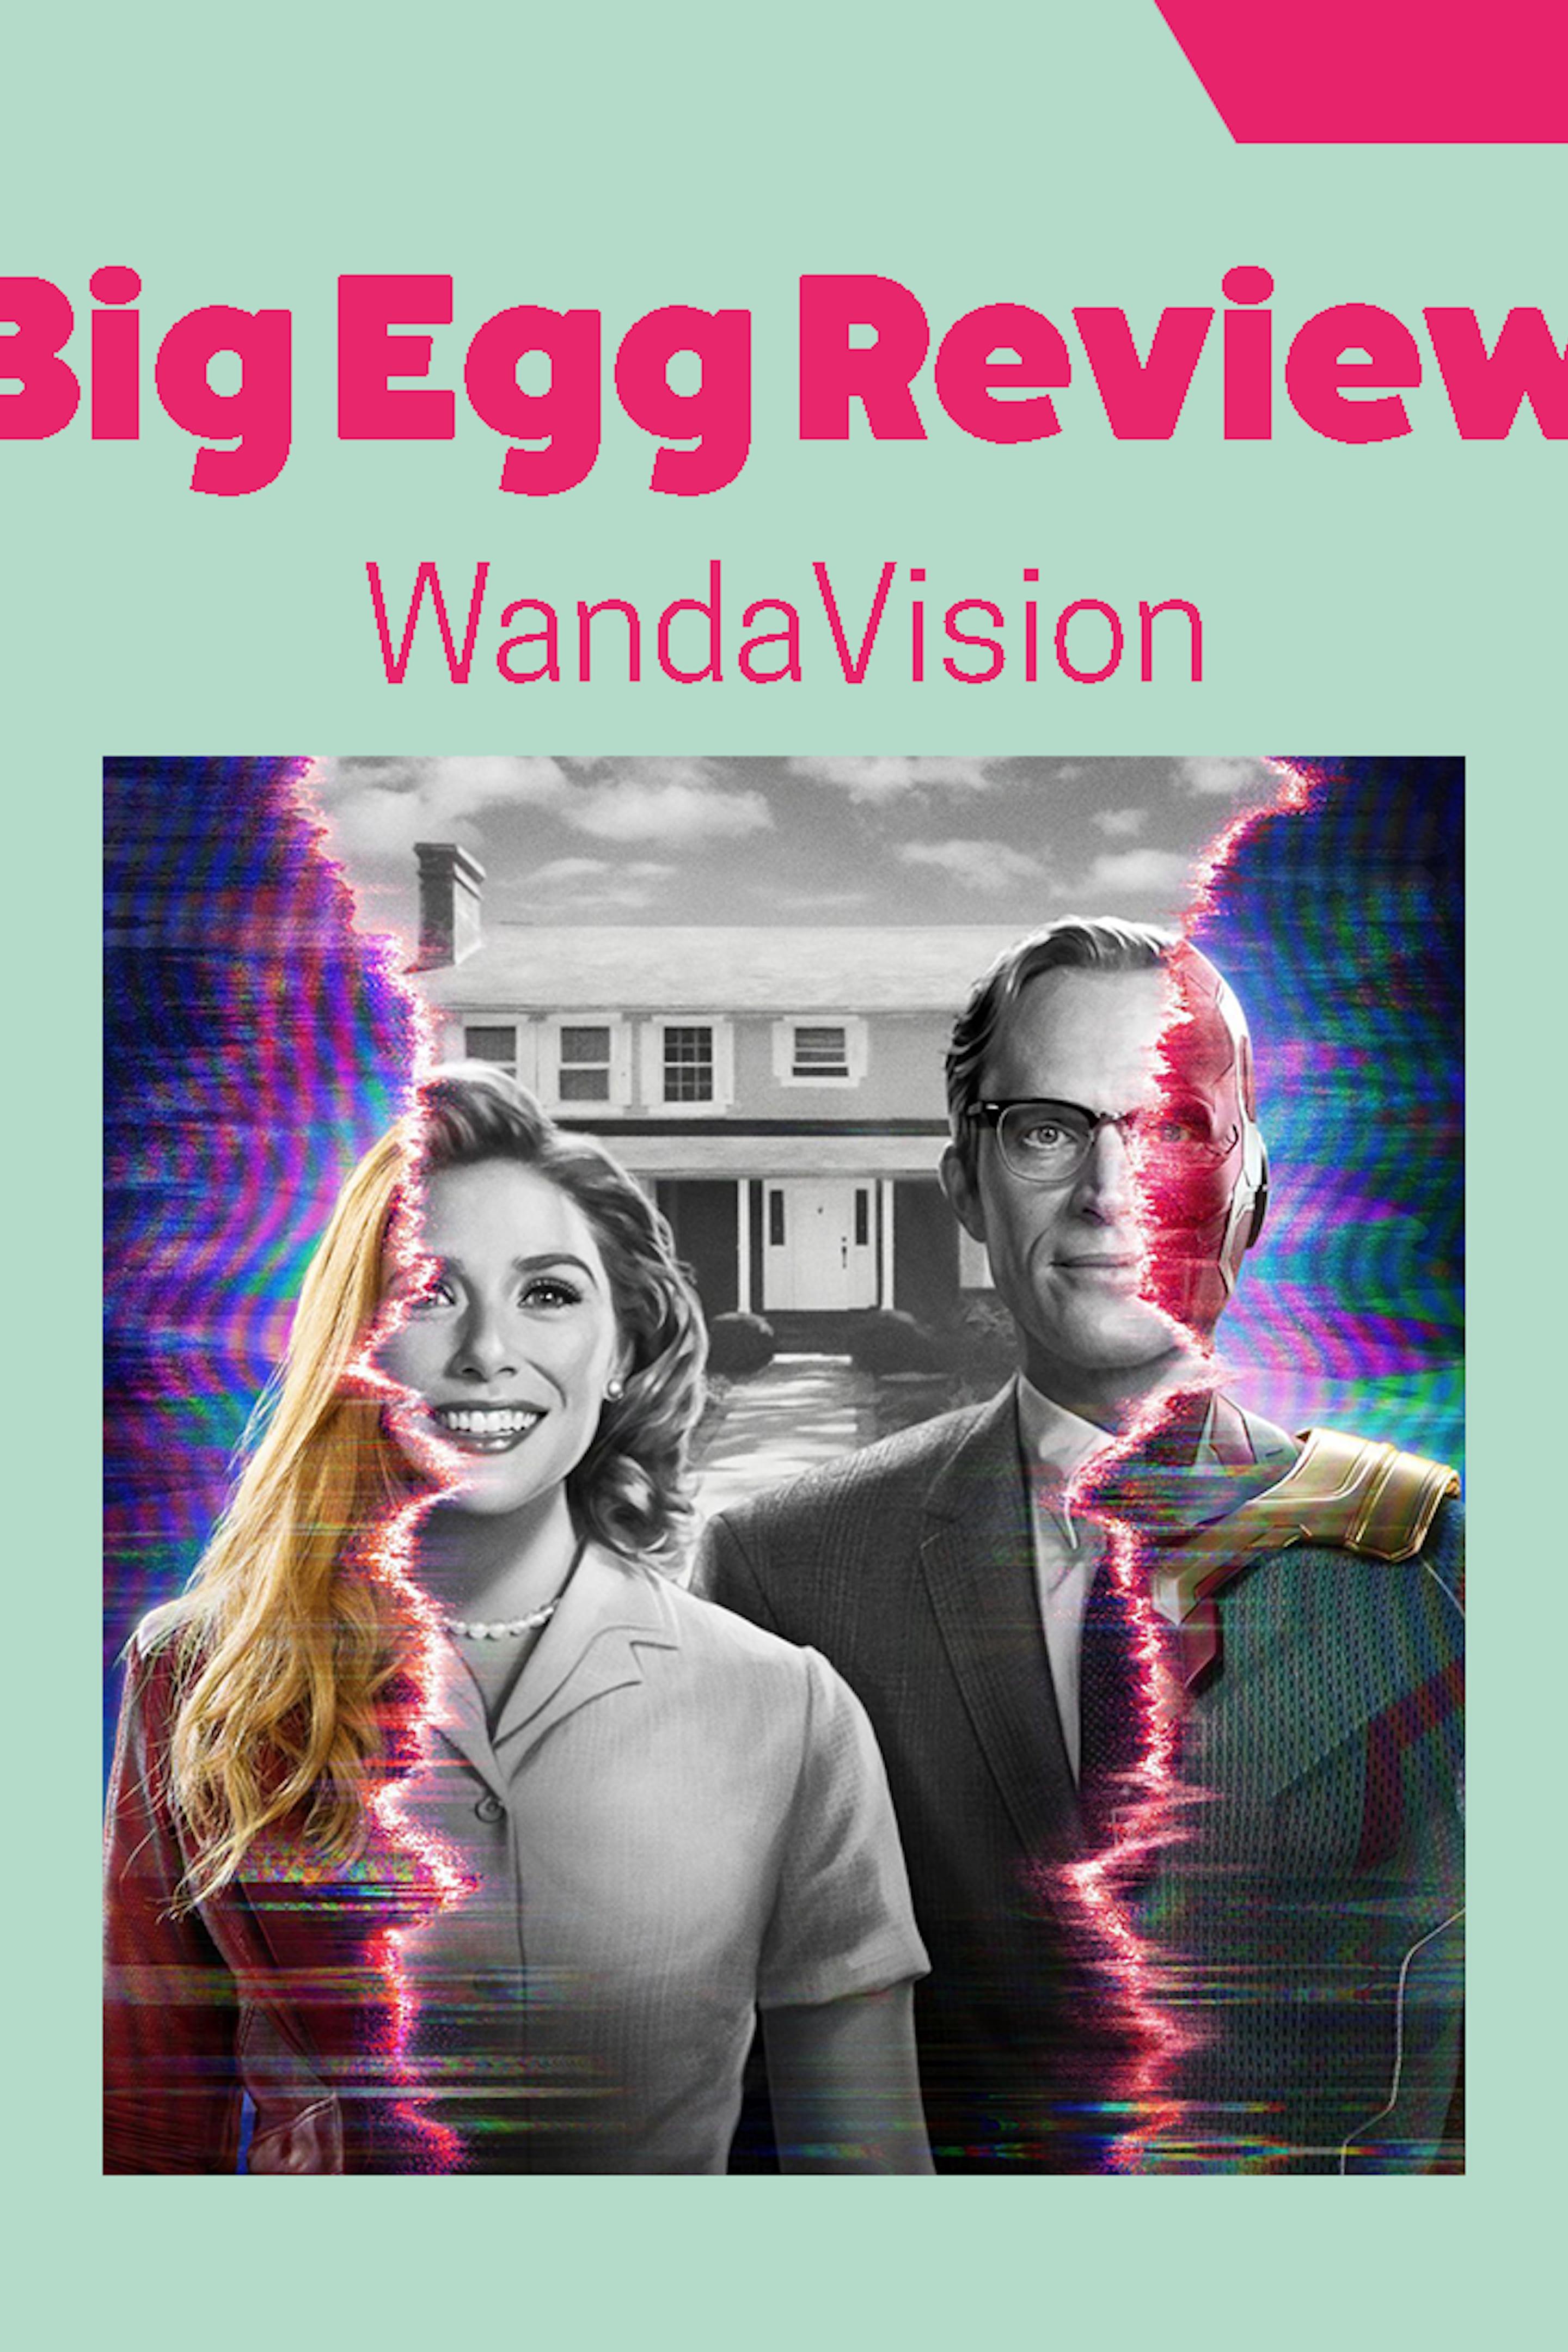 BIG EGG REVIEW: WandaVision